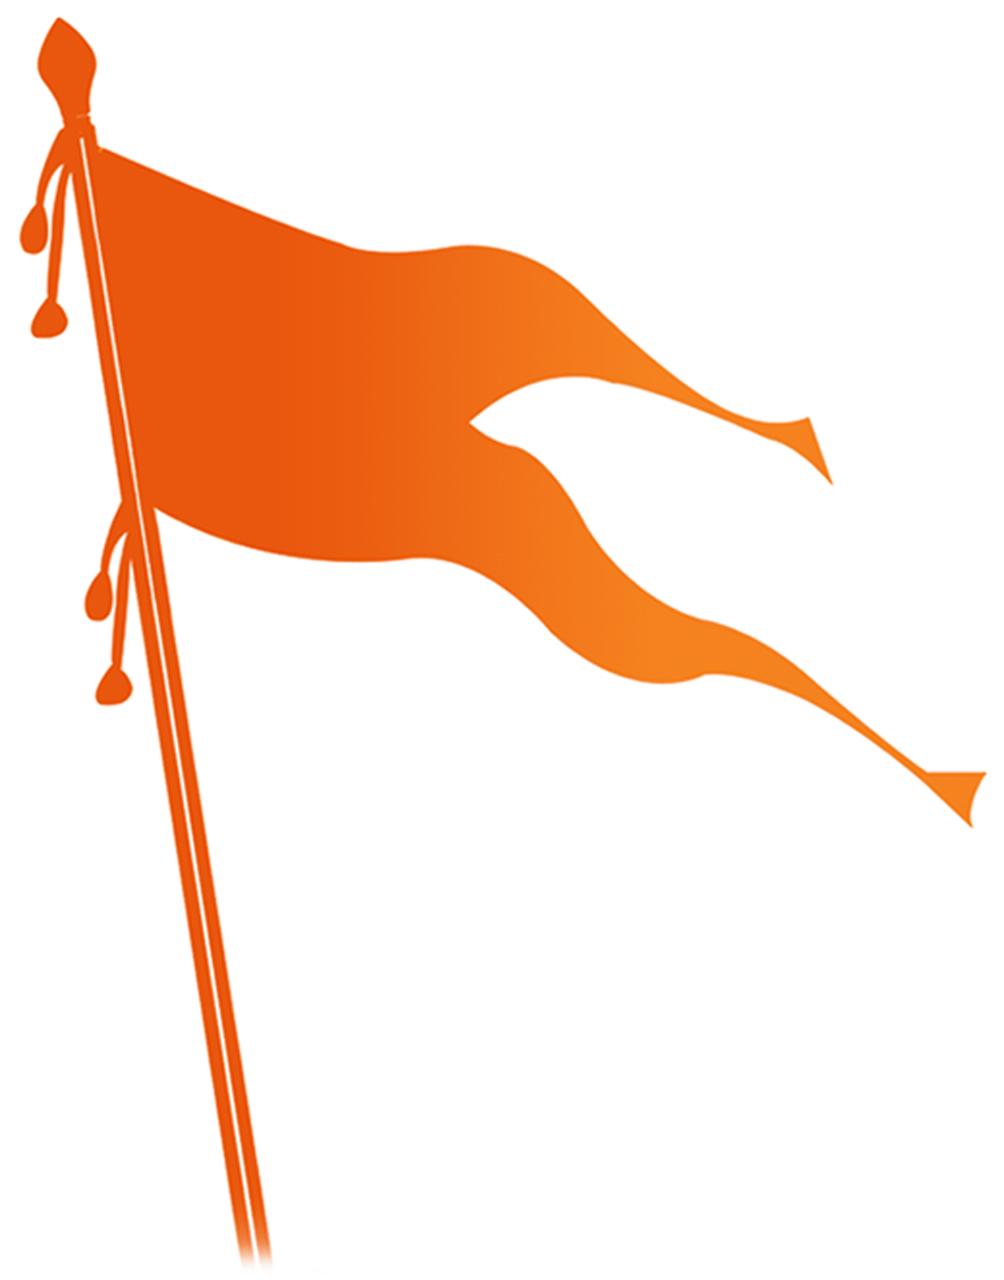 Hindu Activism outside the Sangh Parivar: Dr Koenraad Elst